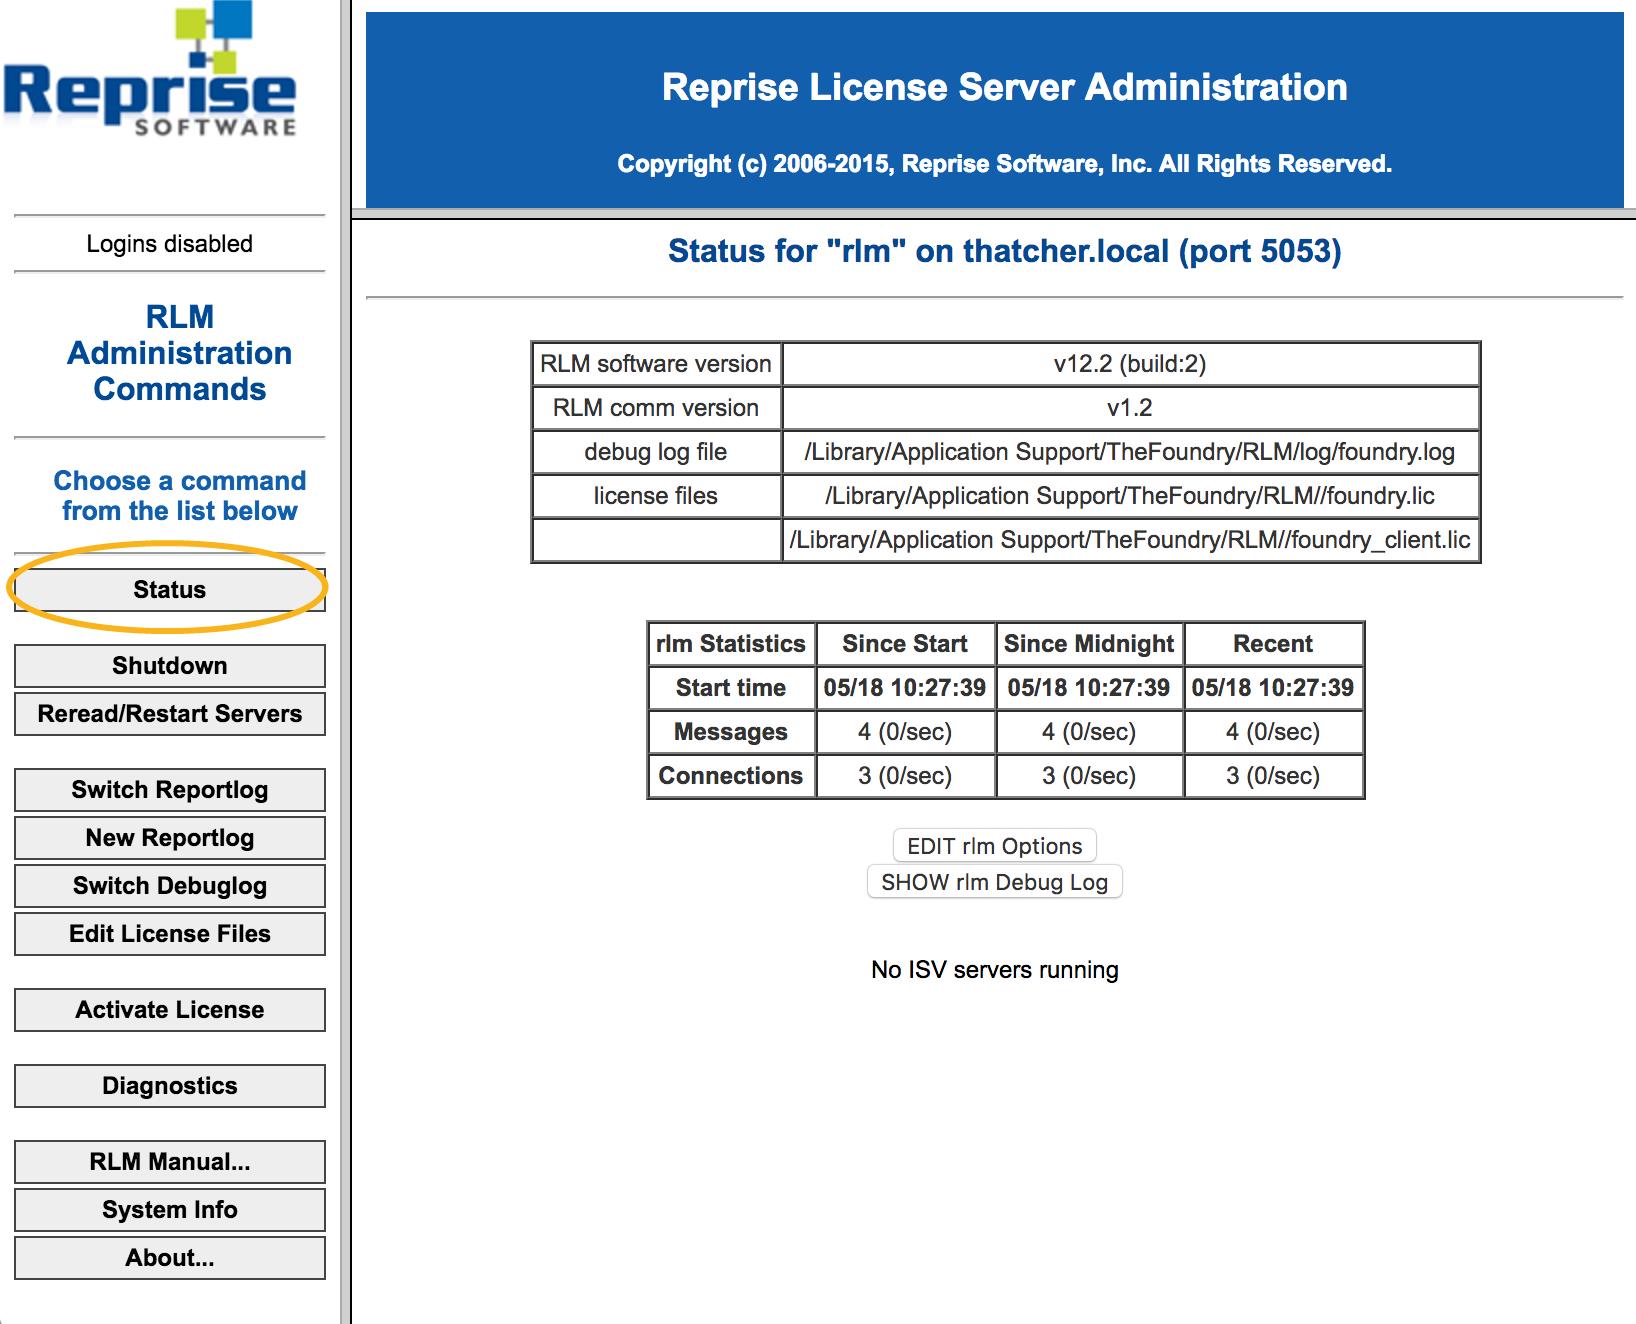 Managing the License Server